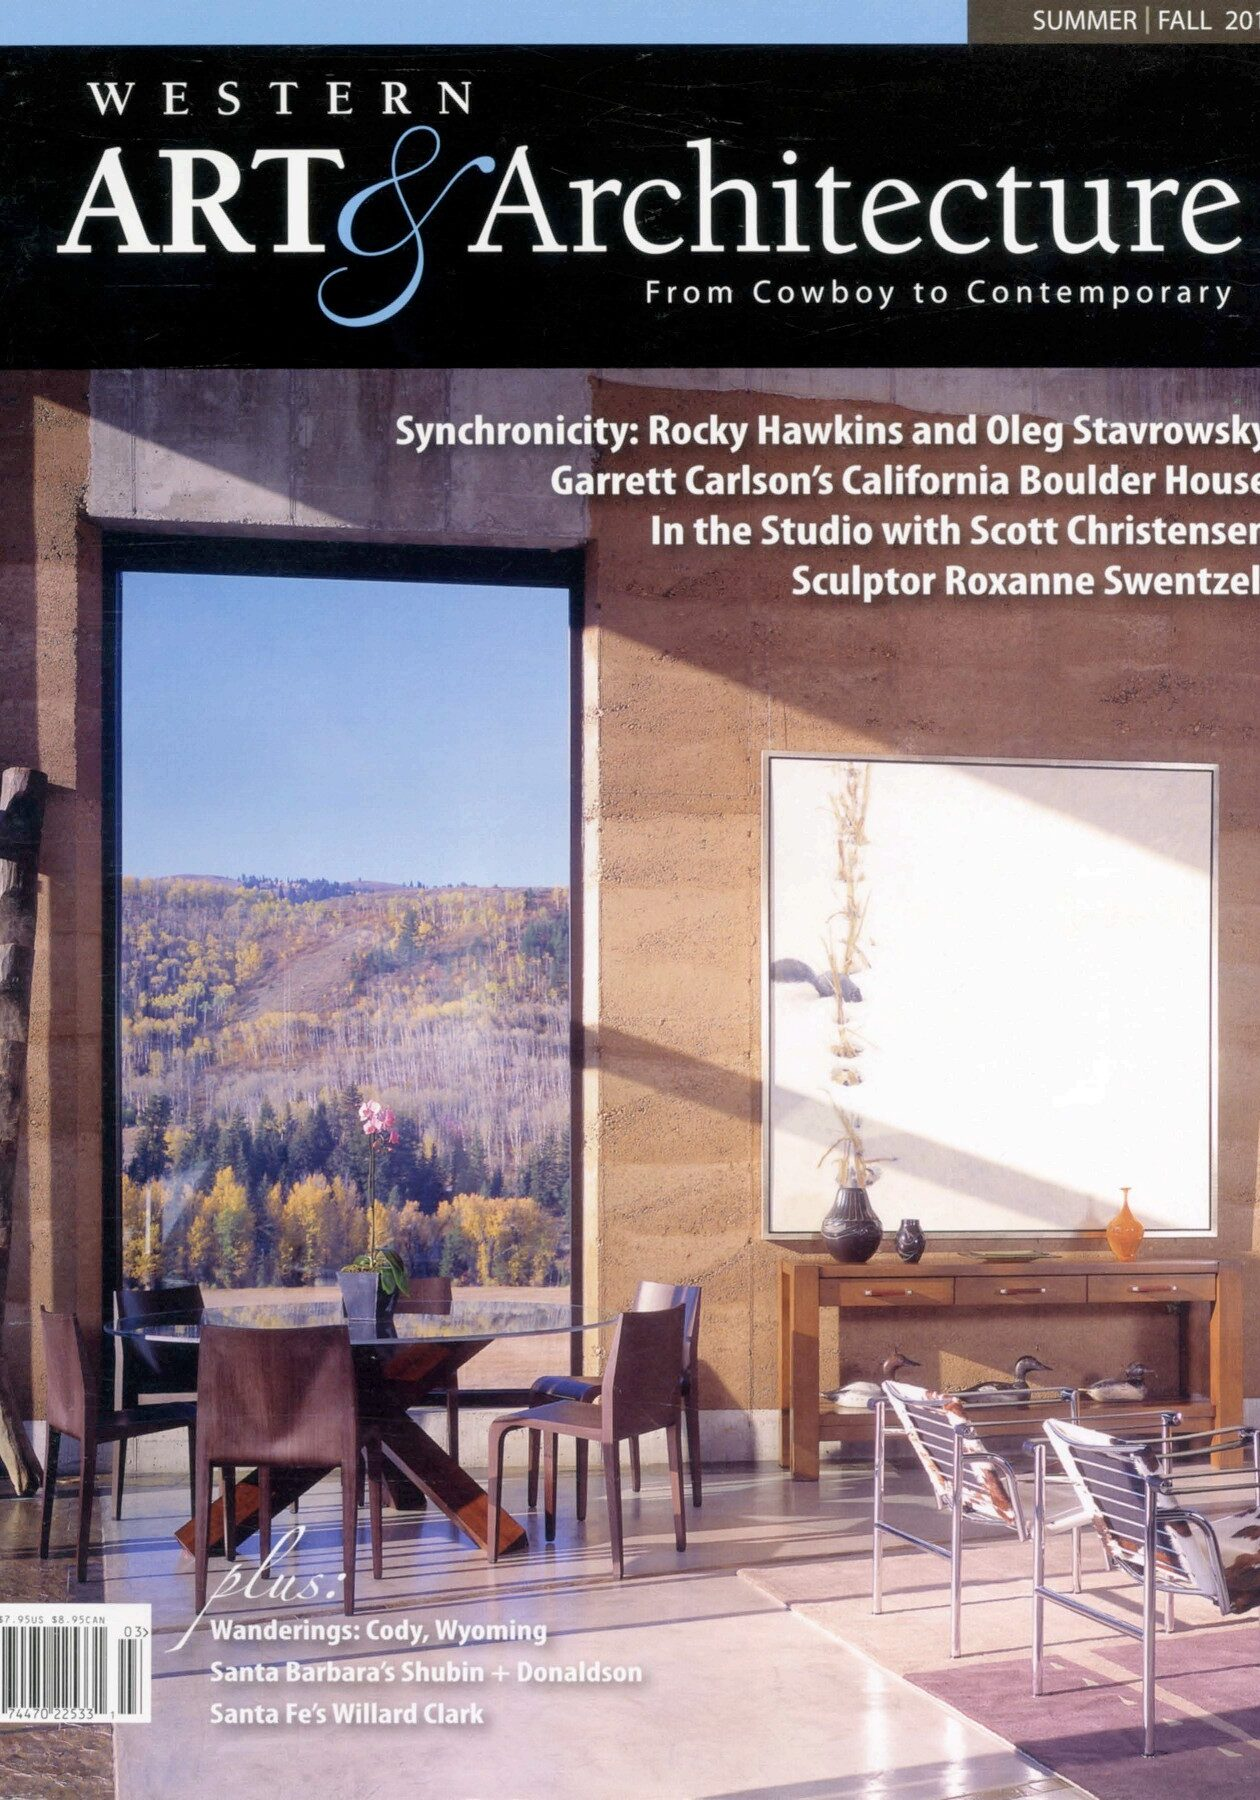 Western Art & Architecture - Summer/Fall 2010